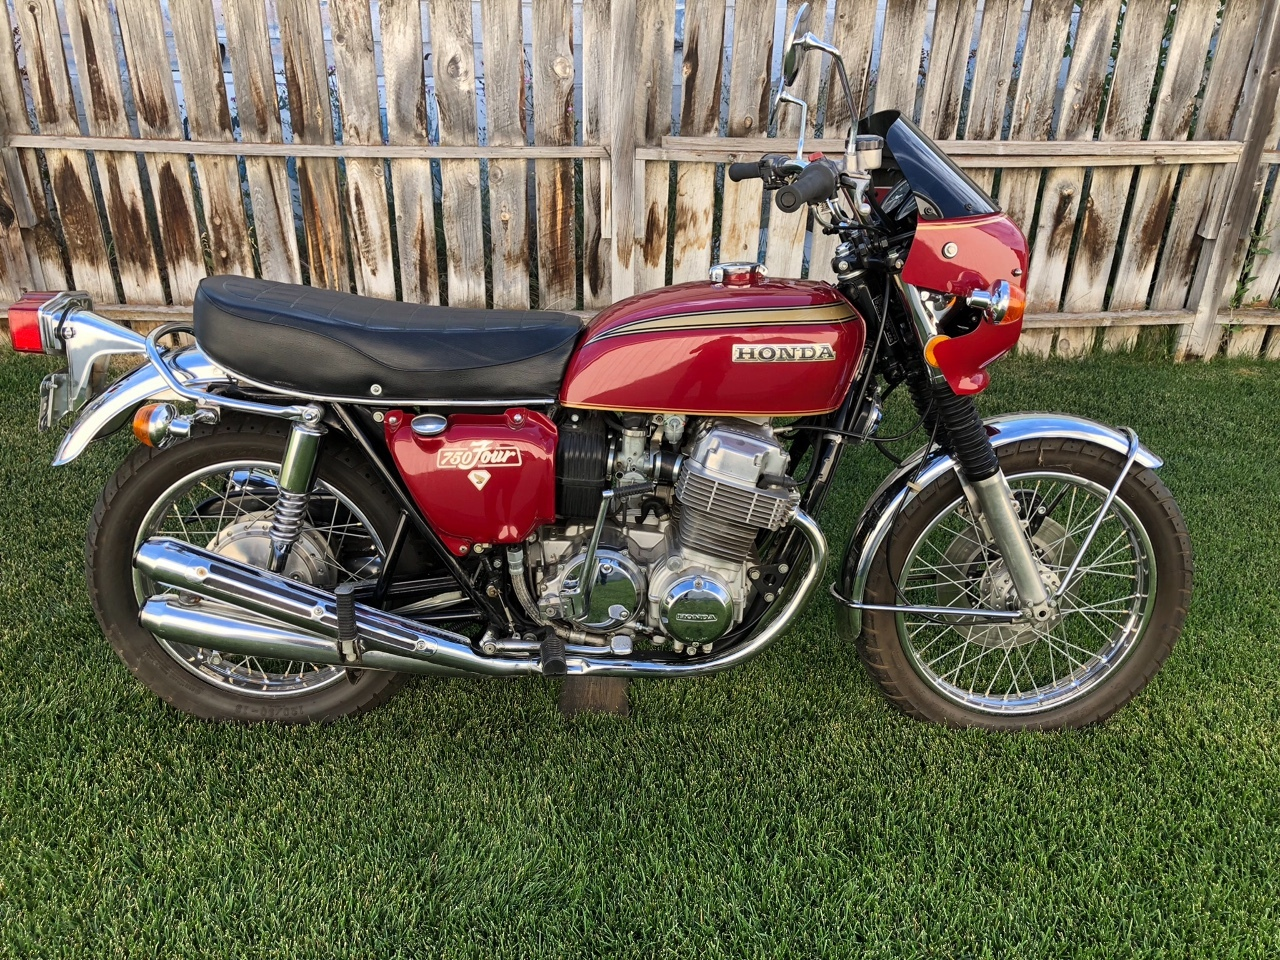 Honda For Sale - Honda Classic 1956--1982 Motorcycles